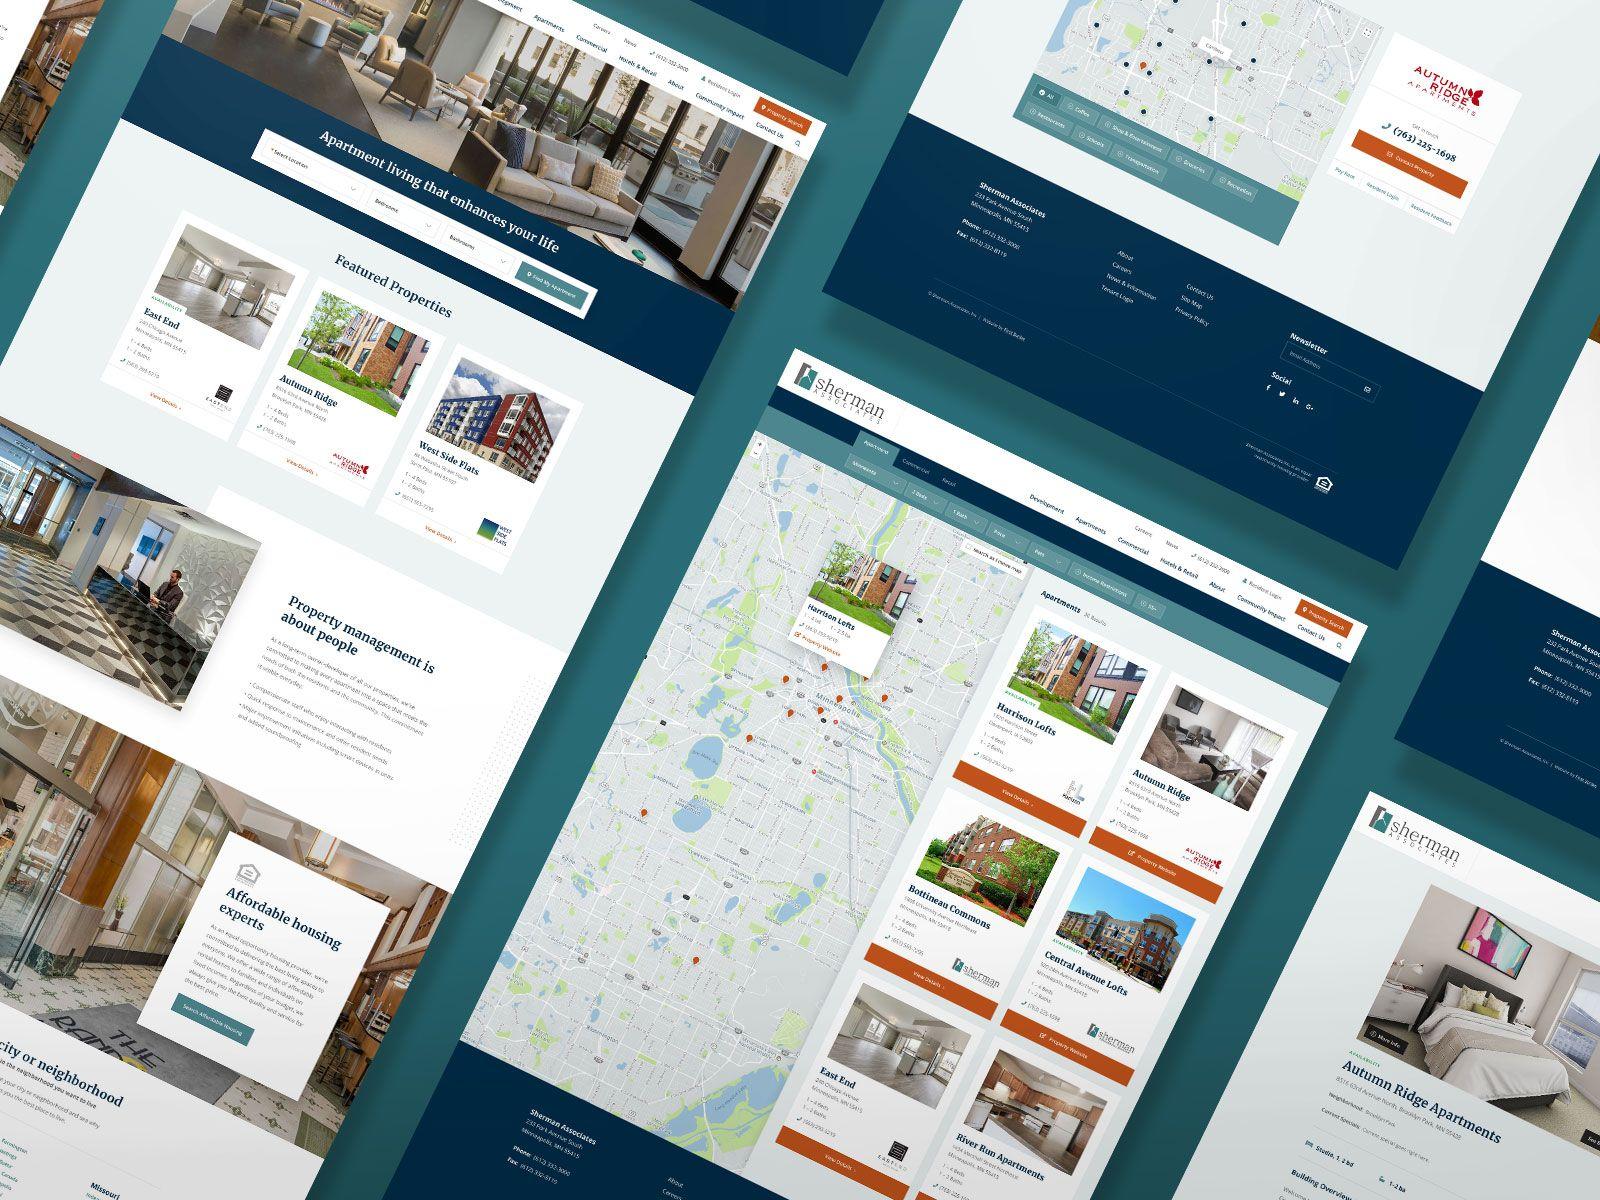 Sherman Property Development Firm Design Graphicdesign Digitalart Graphicdesigner Uxdesign Ux Webdesign Website Design Property Development Web Design